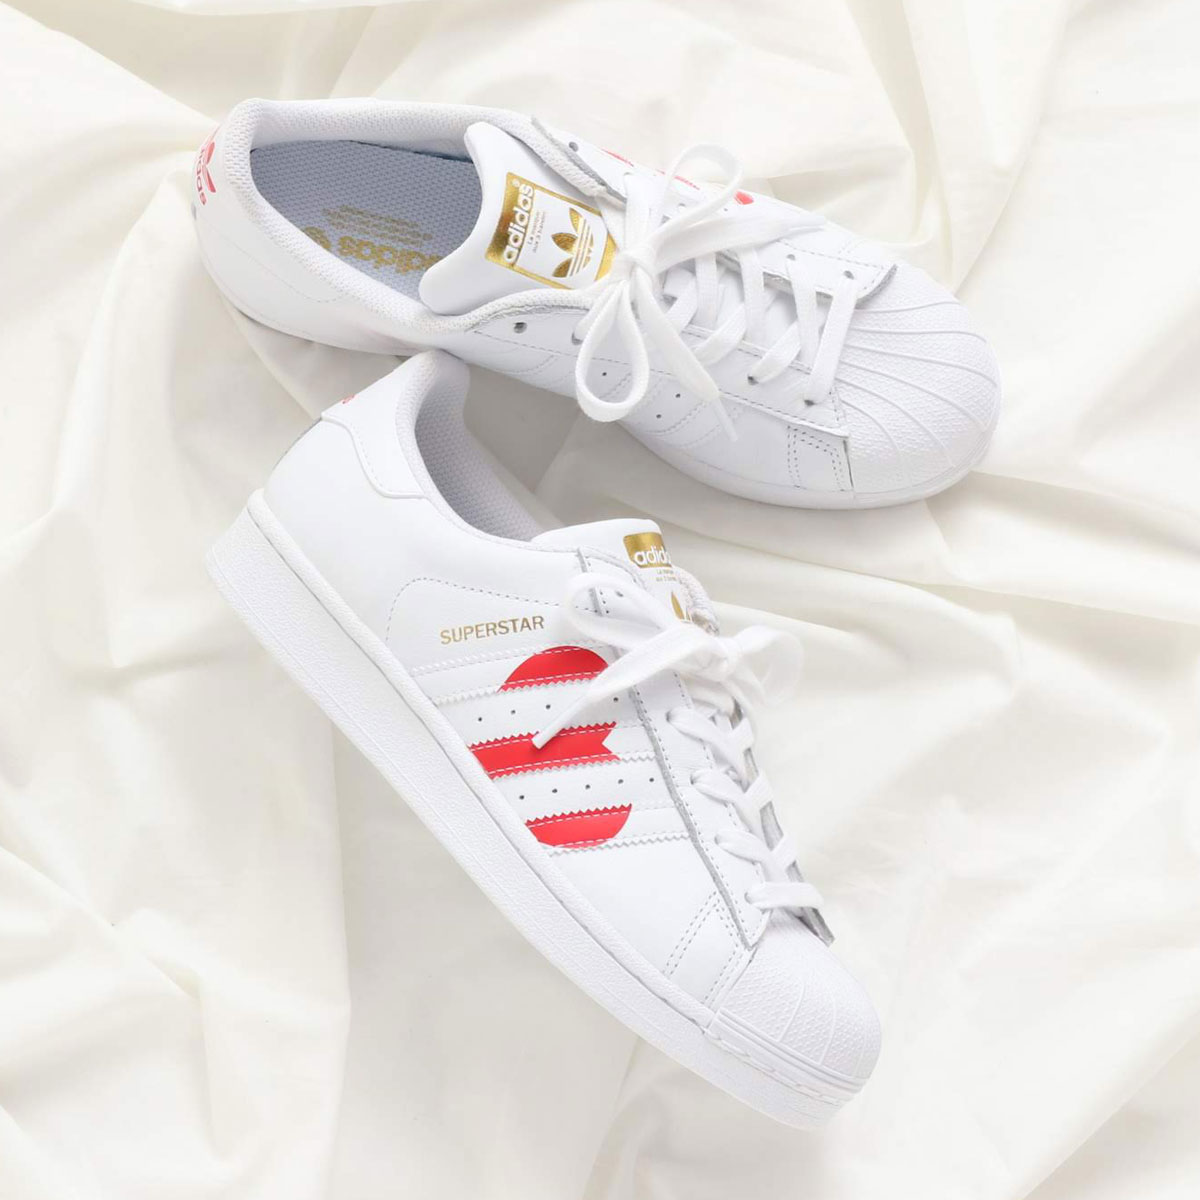 adidas Originals SUPERSTAR (アディダスオリジナルス スーパースター) RUNNING WHITE/COLLEGE RED/GOLD MET【メンズ レディース スニーカー】19SS-I